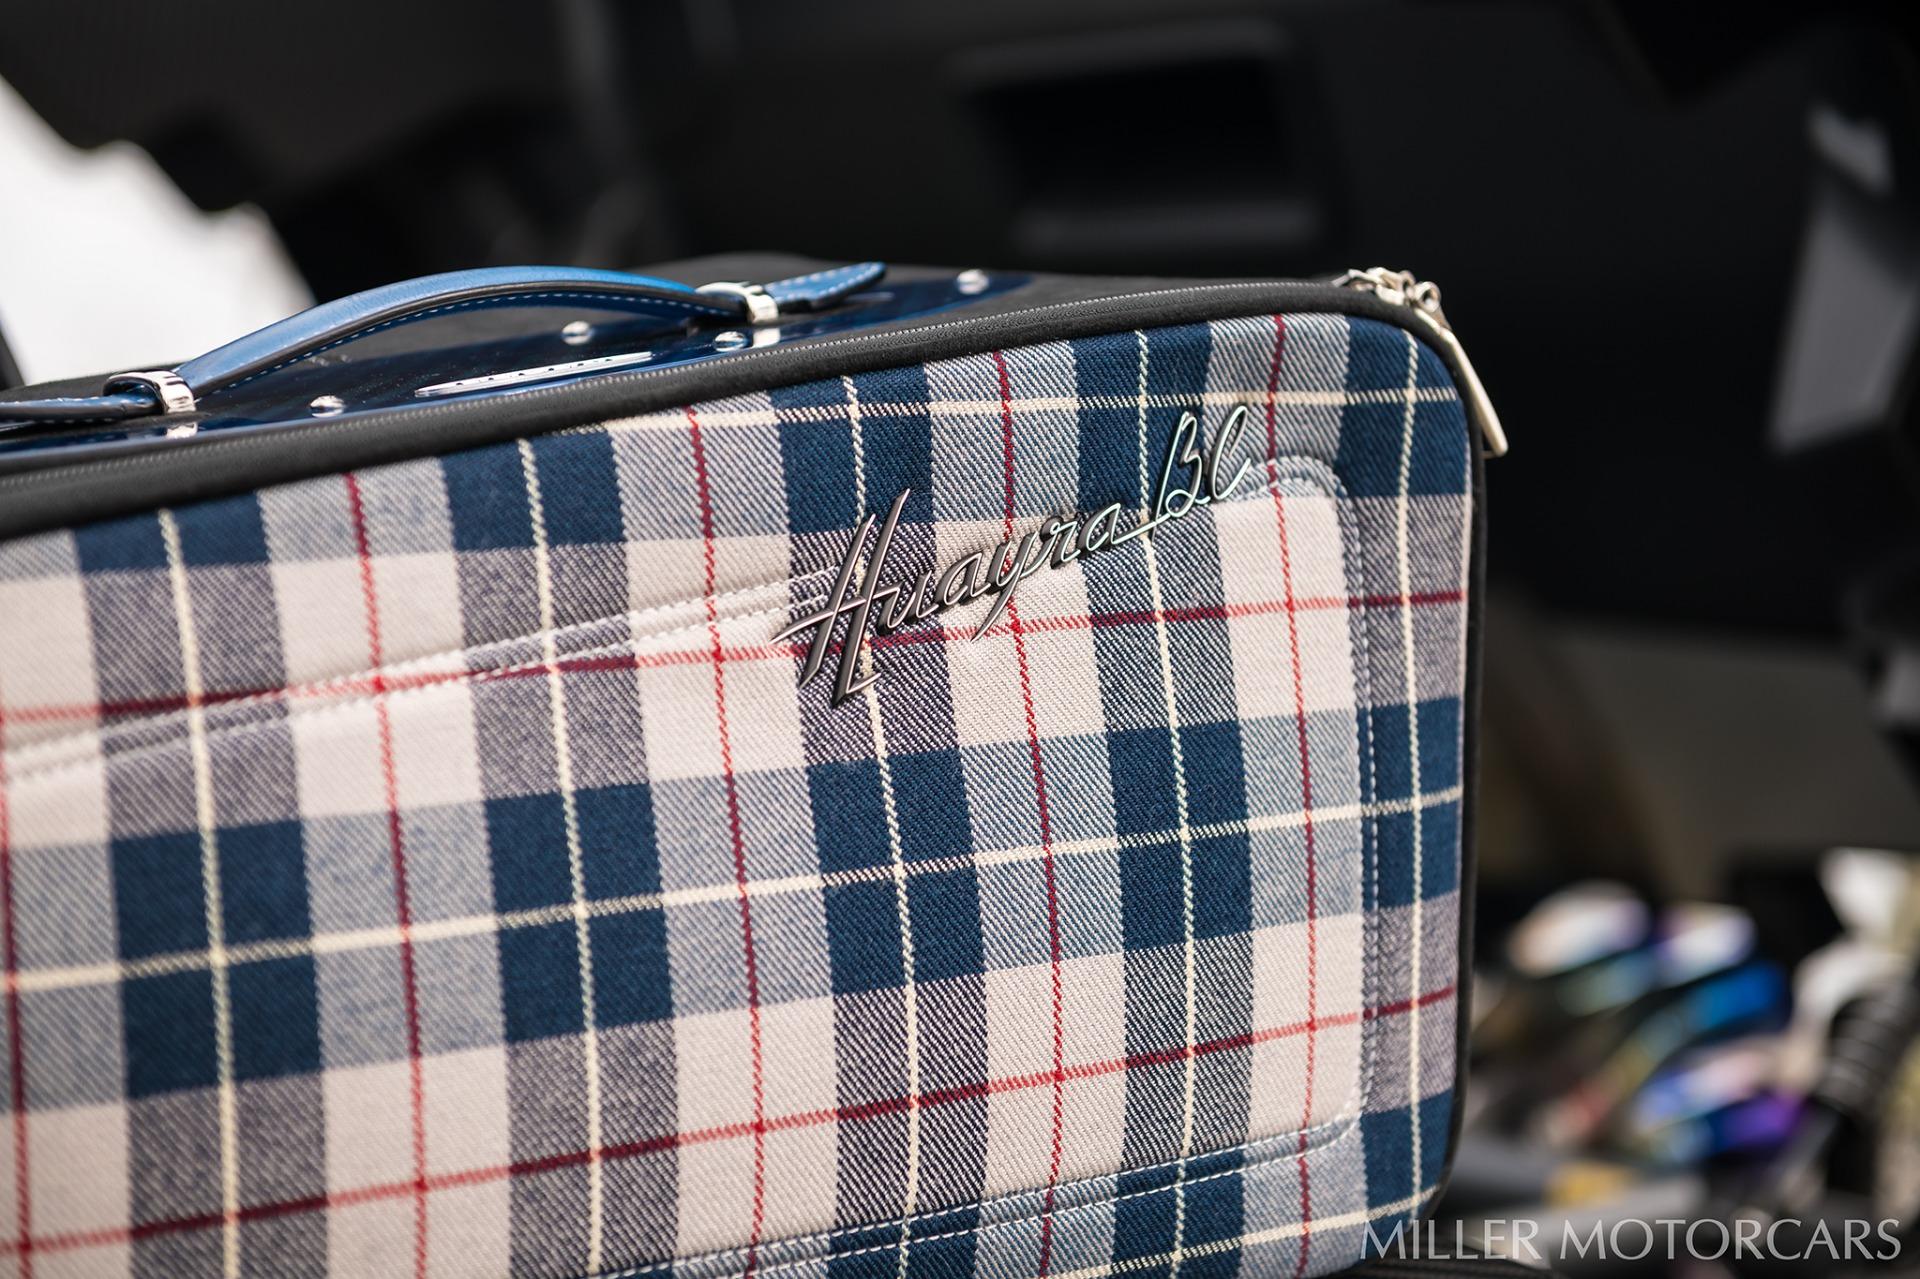 Used 2017 Pagani Huayra BC Macchina Volante For Sale In Greenwich, CT. Alfa Romeo of Greenwich, P34C 3051_p31